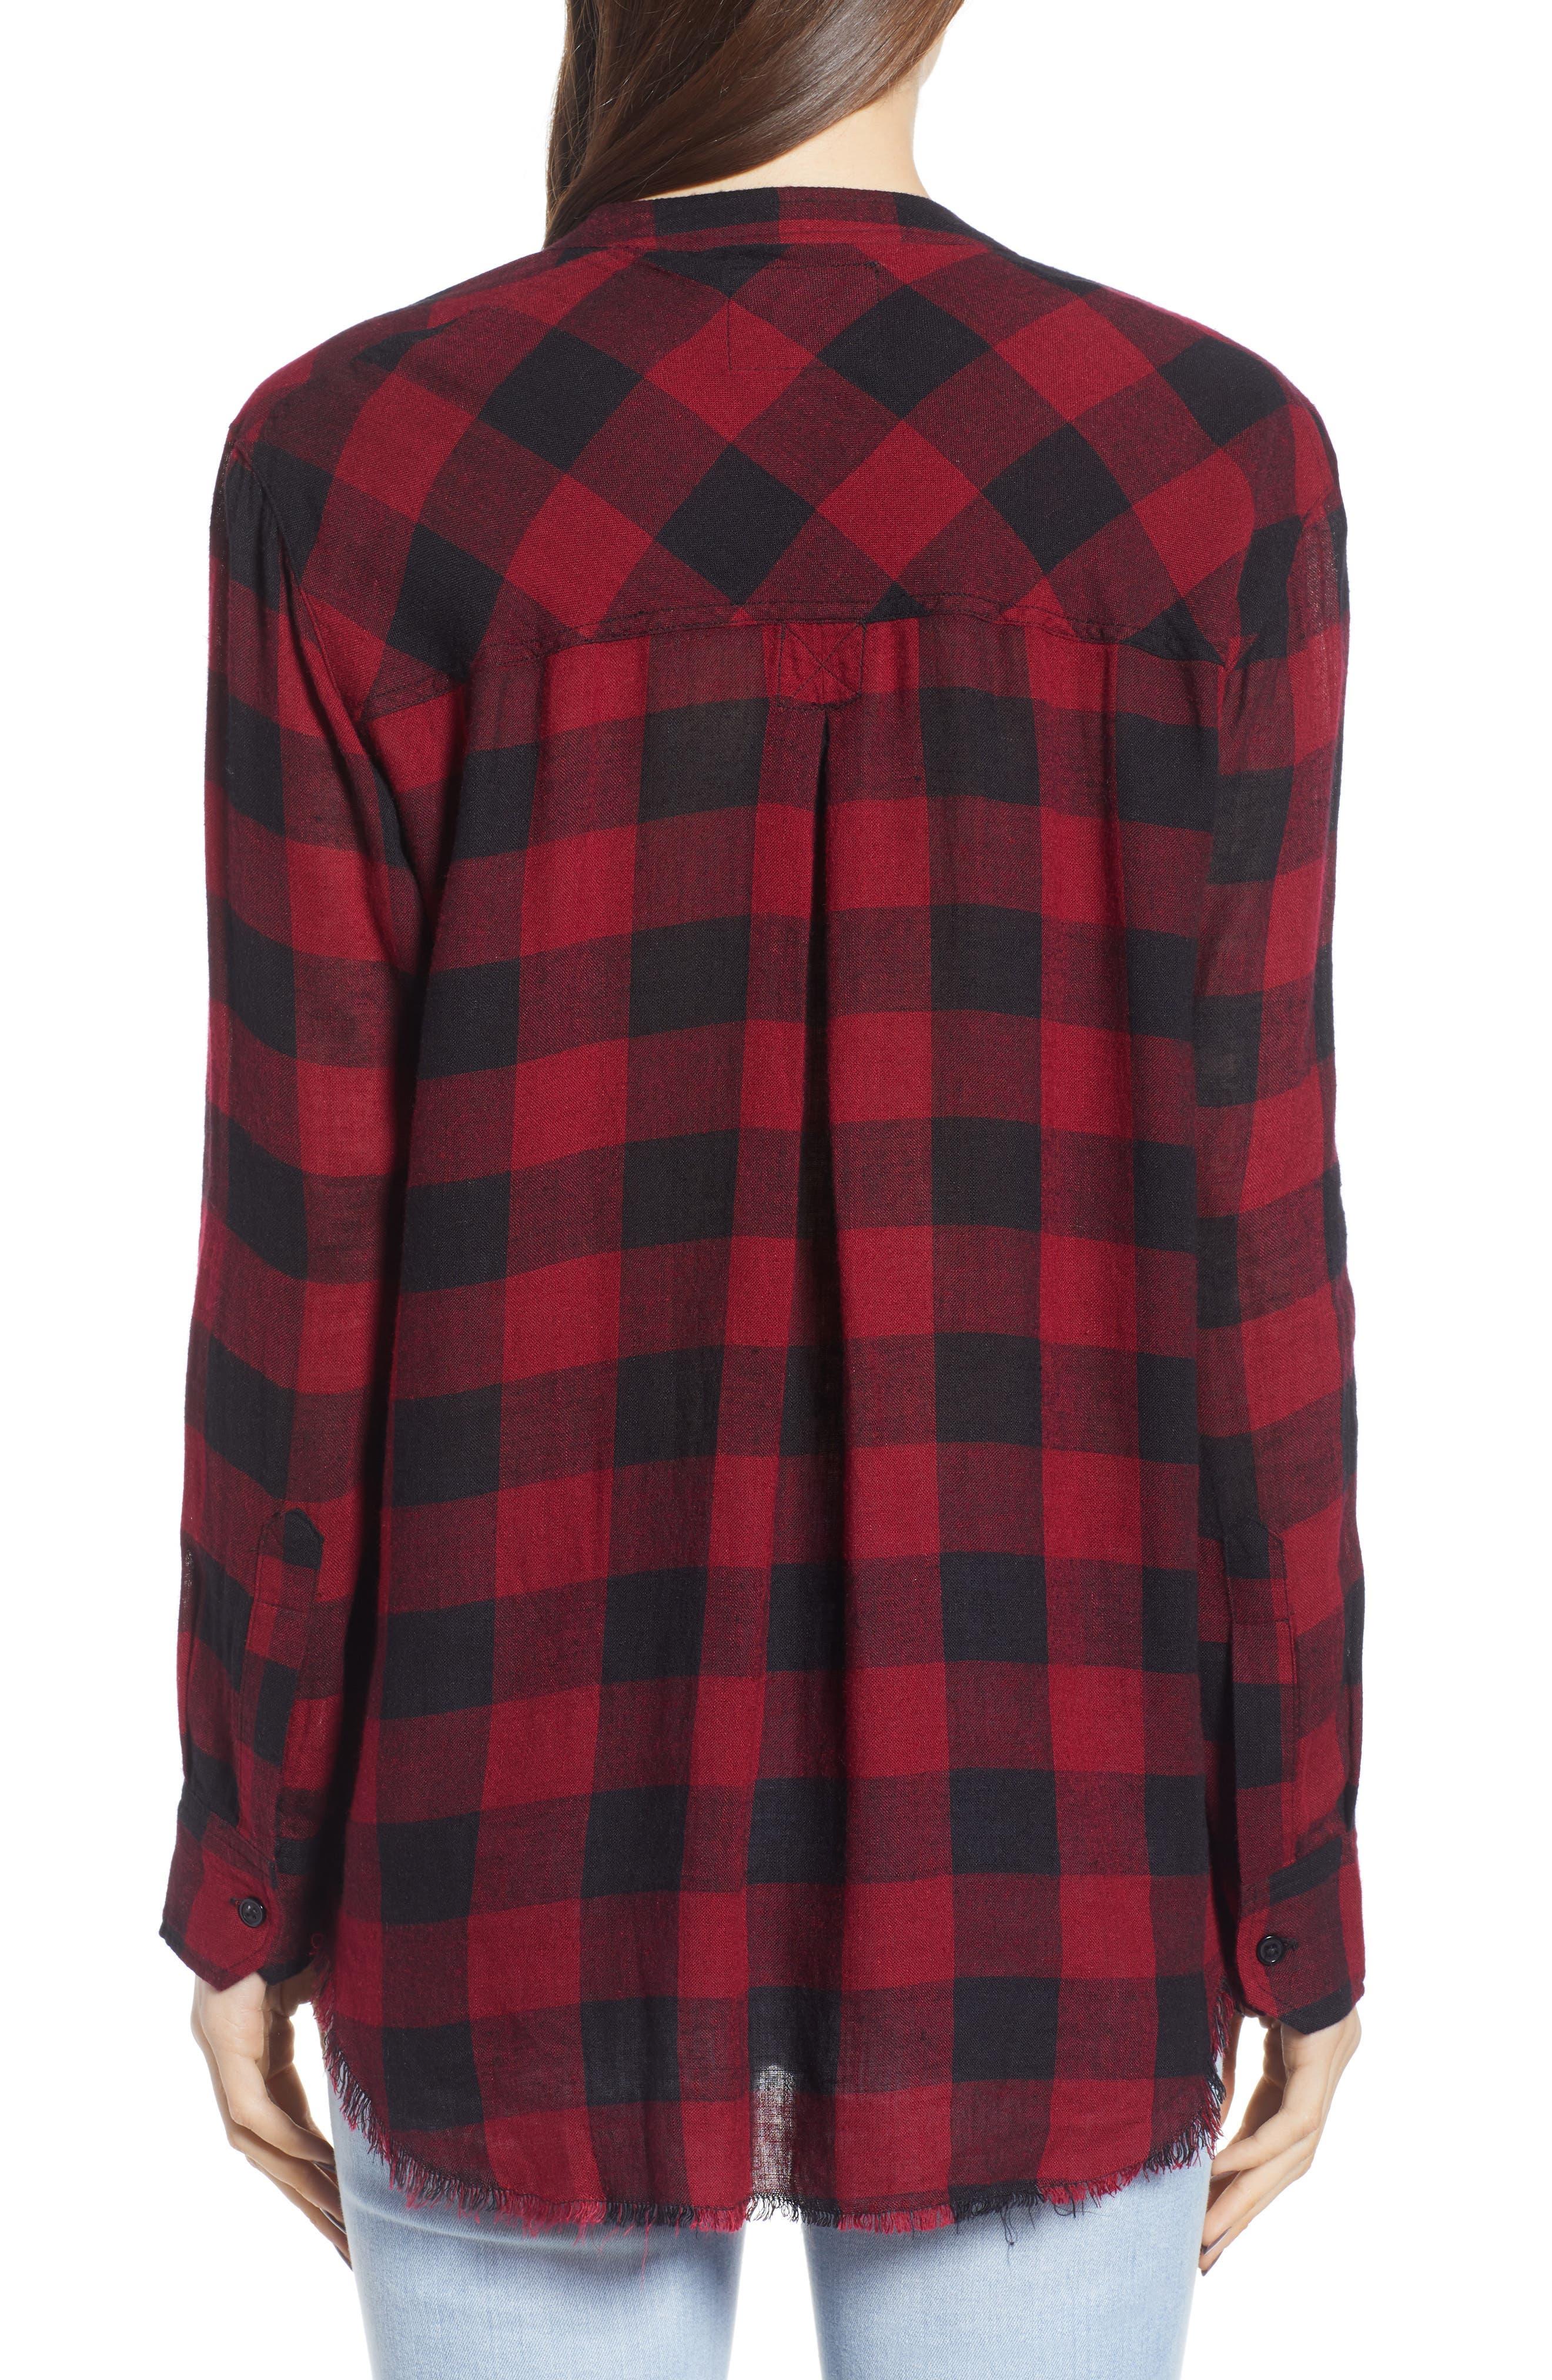 Redding Plaid Shirt,                             Alternate thumbnail 2, color,                             006